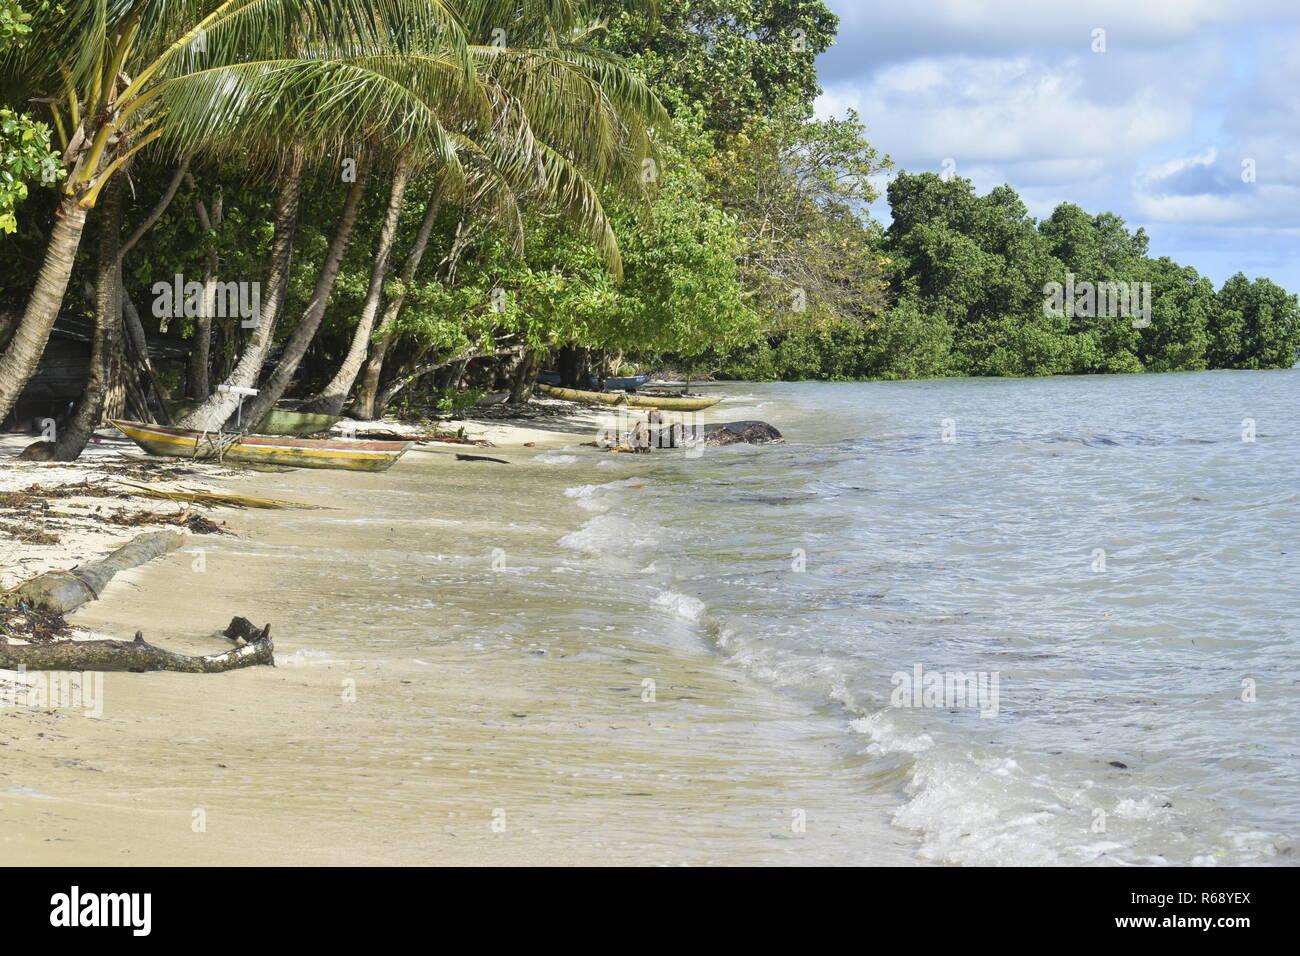 Beach front Kesa - Stock Image